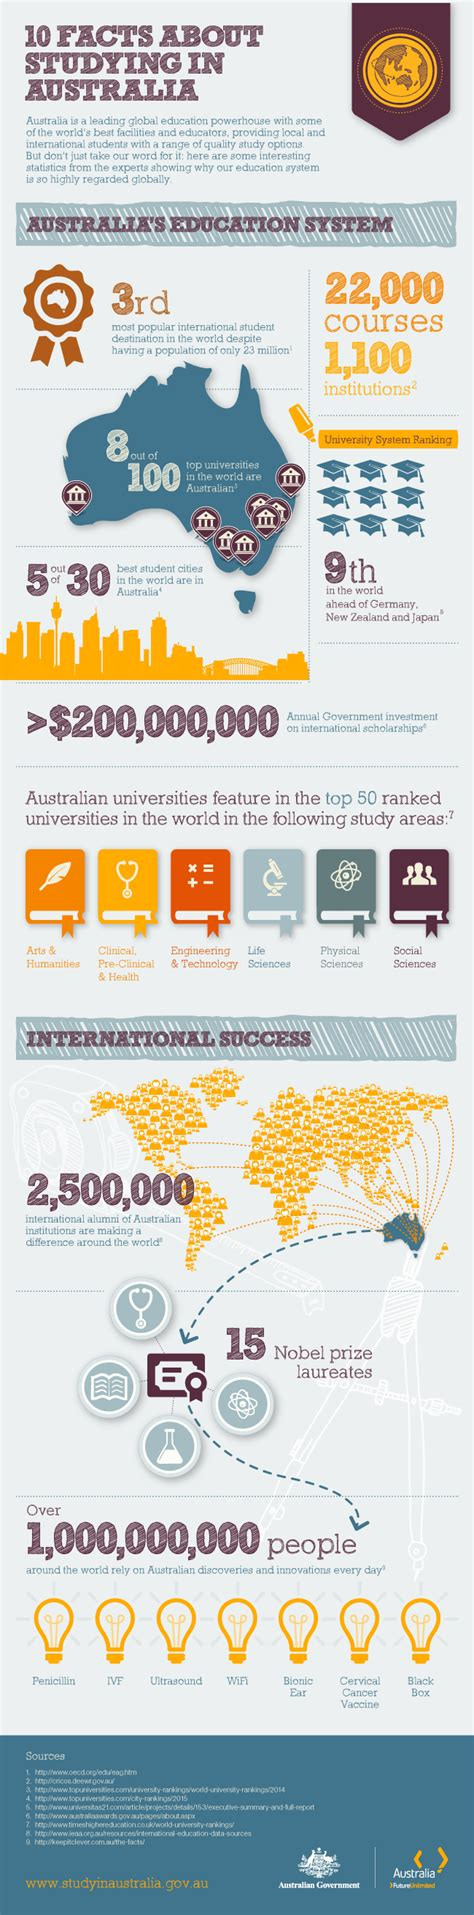 insomnia study the west australian لماذا الدراسة في أستراليا